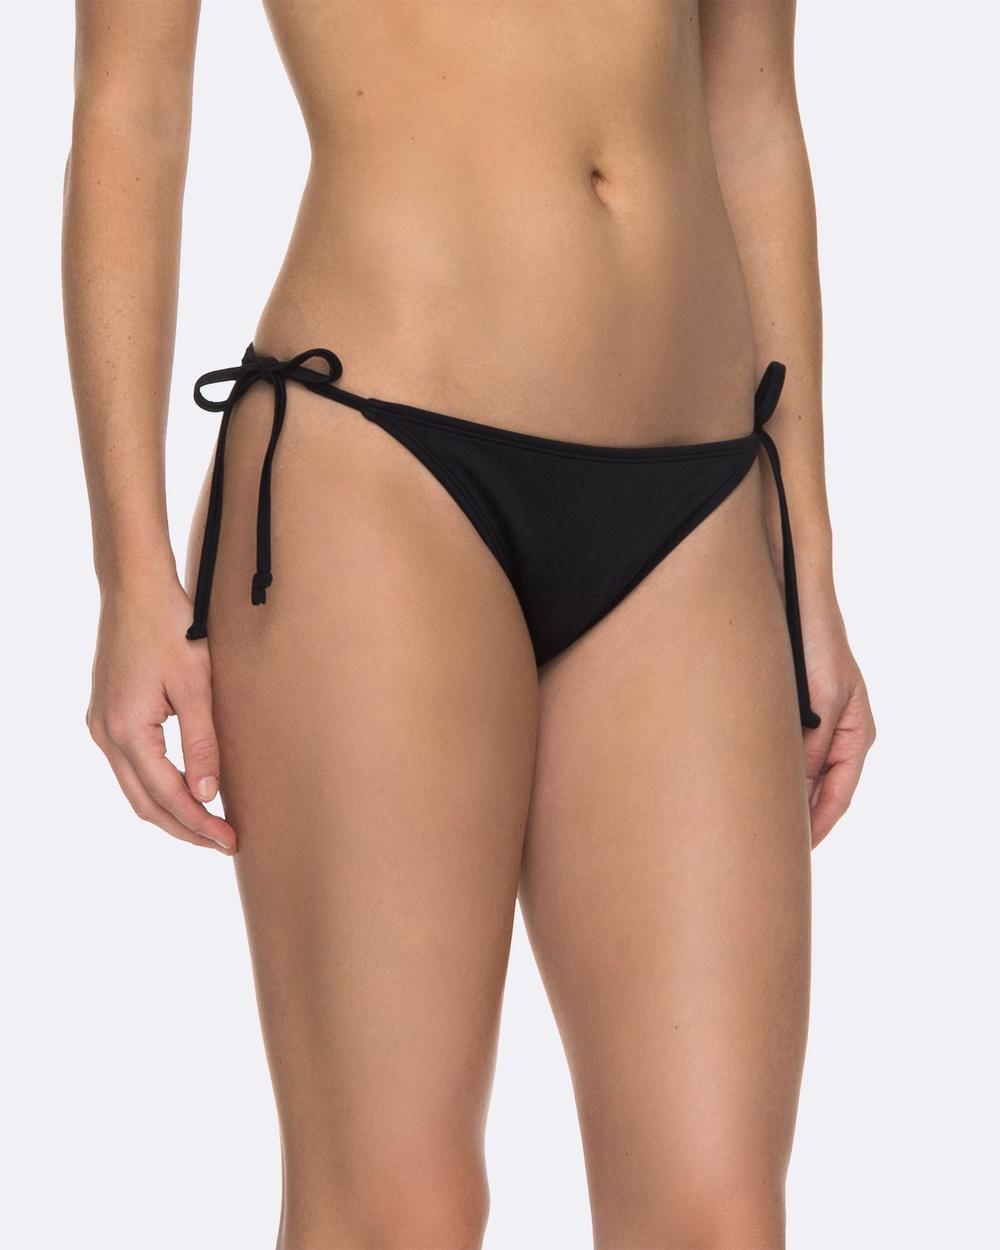 Roxy Womens ROXY Essentials Surfer Separate Bikini Pant Bikini Bottoms Anthracite Womens ROXY Essentials Surfer Separate Bikini Pant